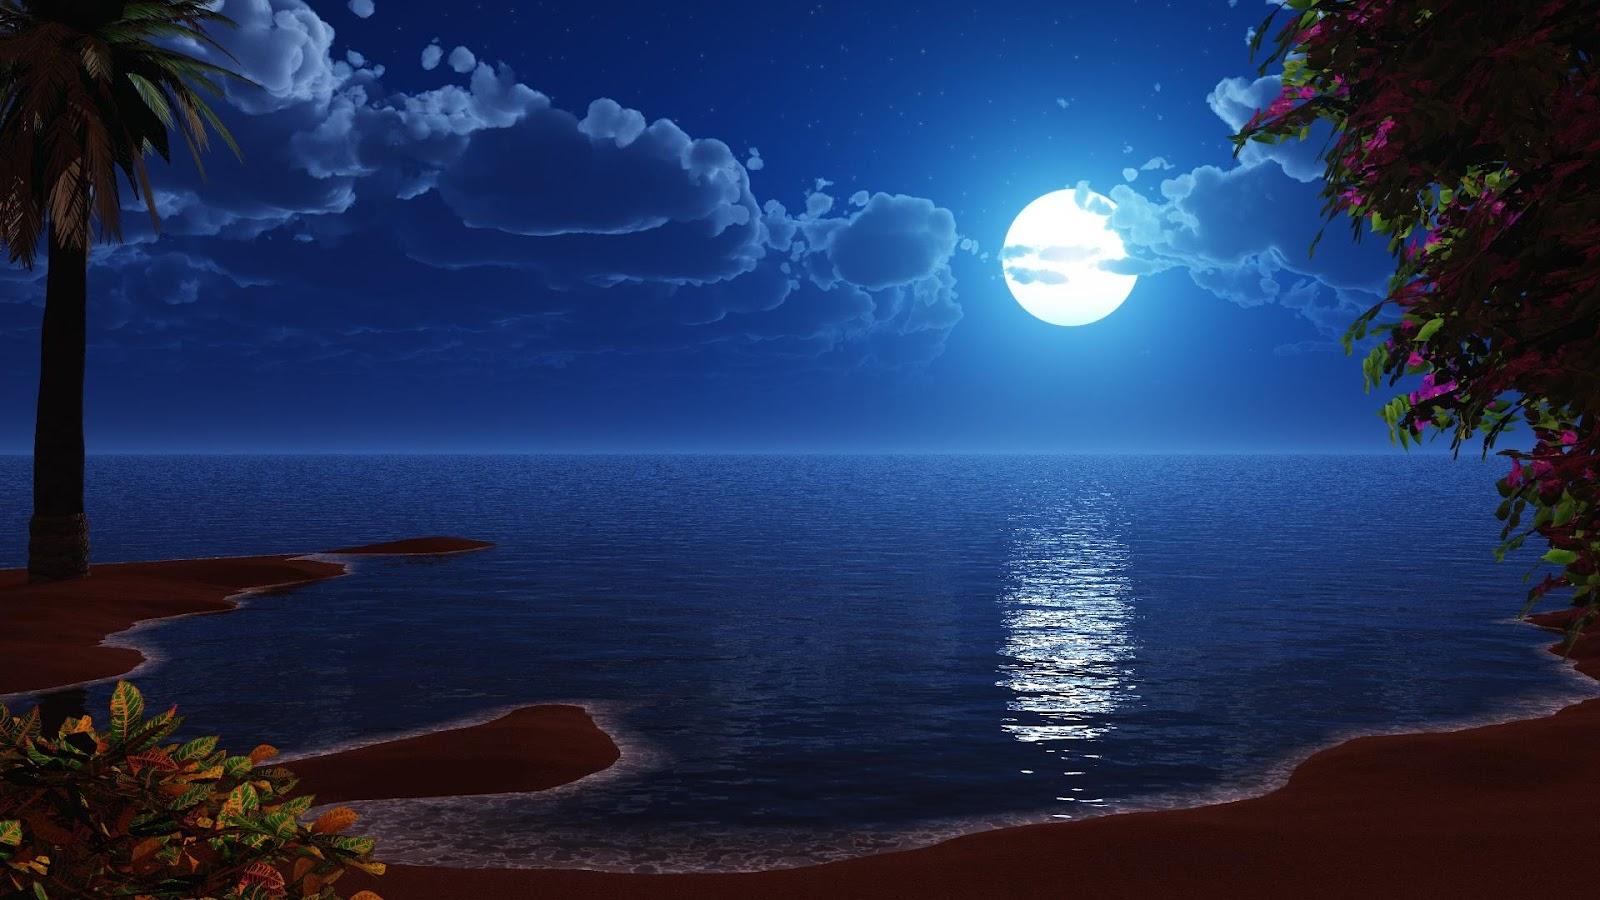 http://1.bp.blogspot.com/-rx4MWvloDWo/UGQo0iauMcI/AAAAAAAAF7g/bSVZweI6zJo/s1600/Full_Moon_Wallpaper_7.jpg